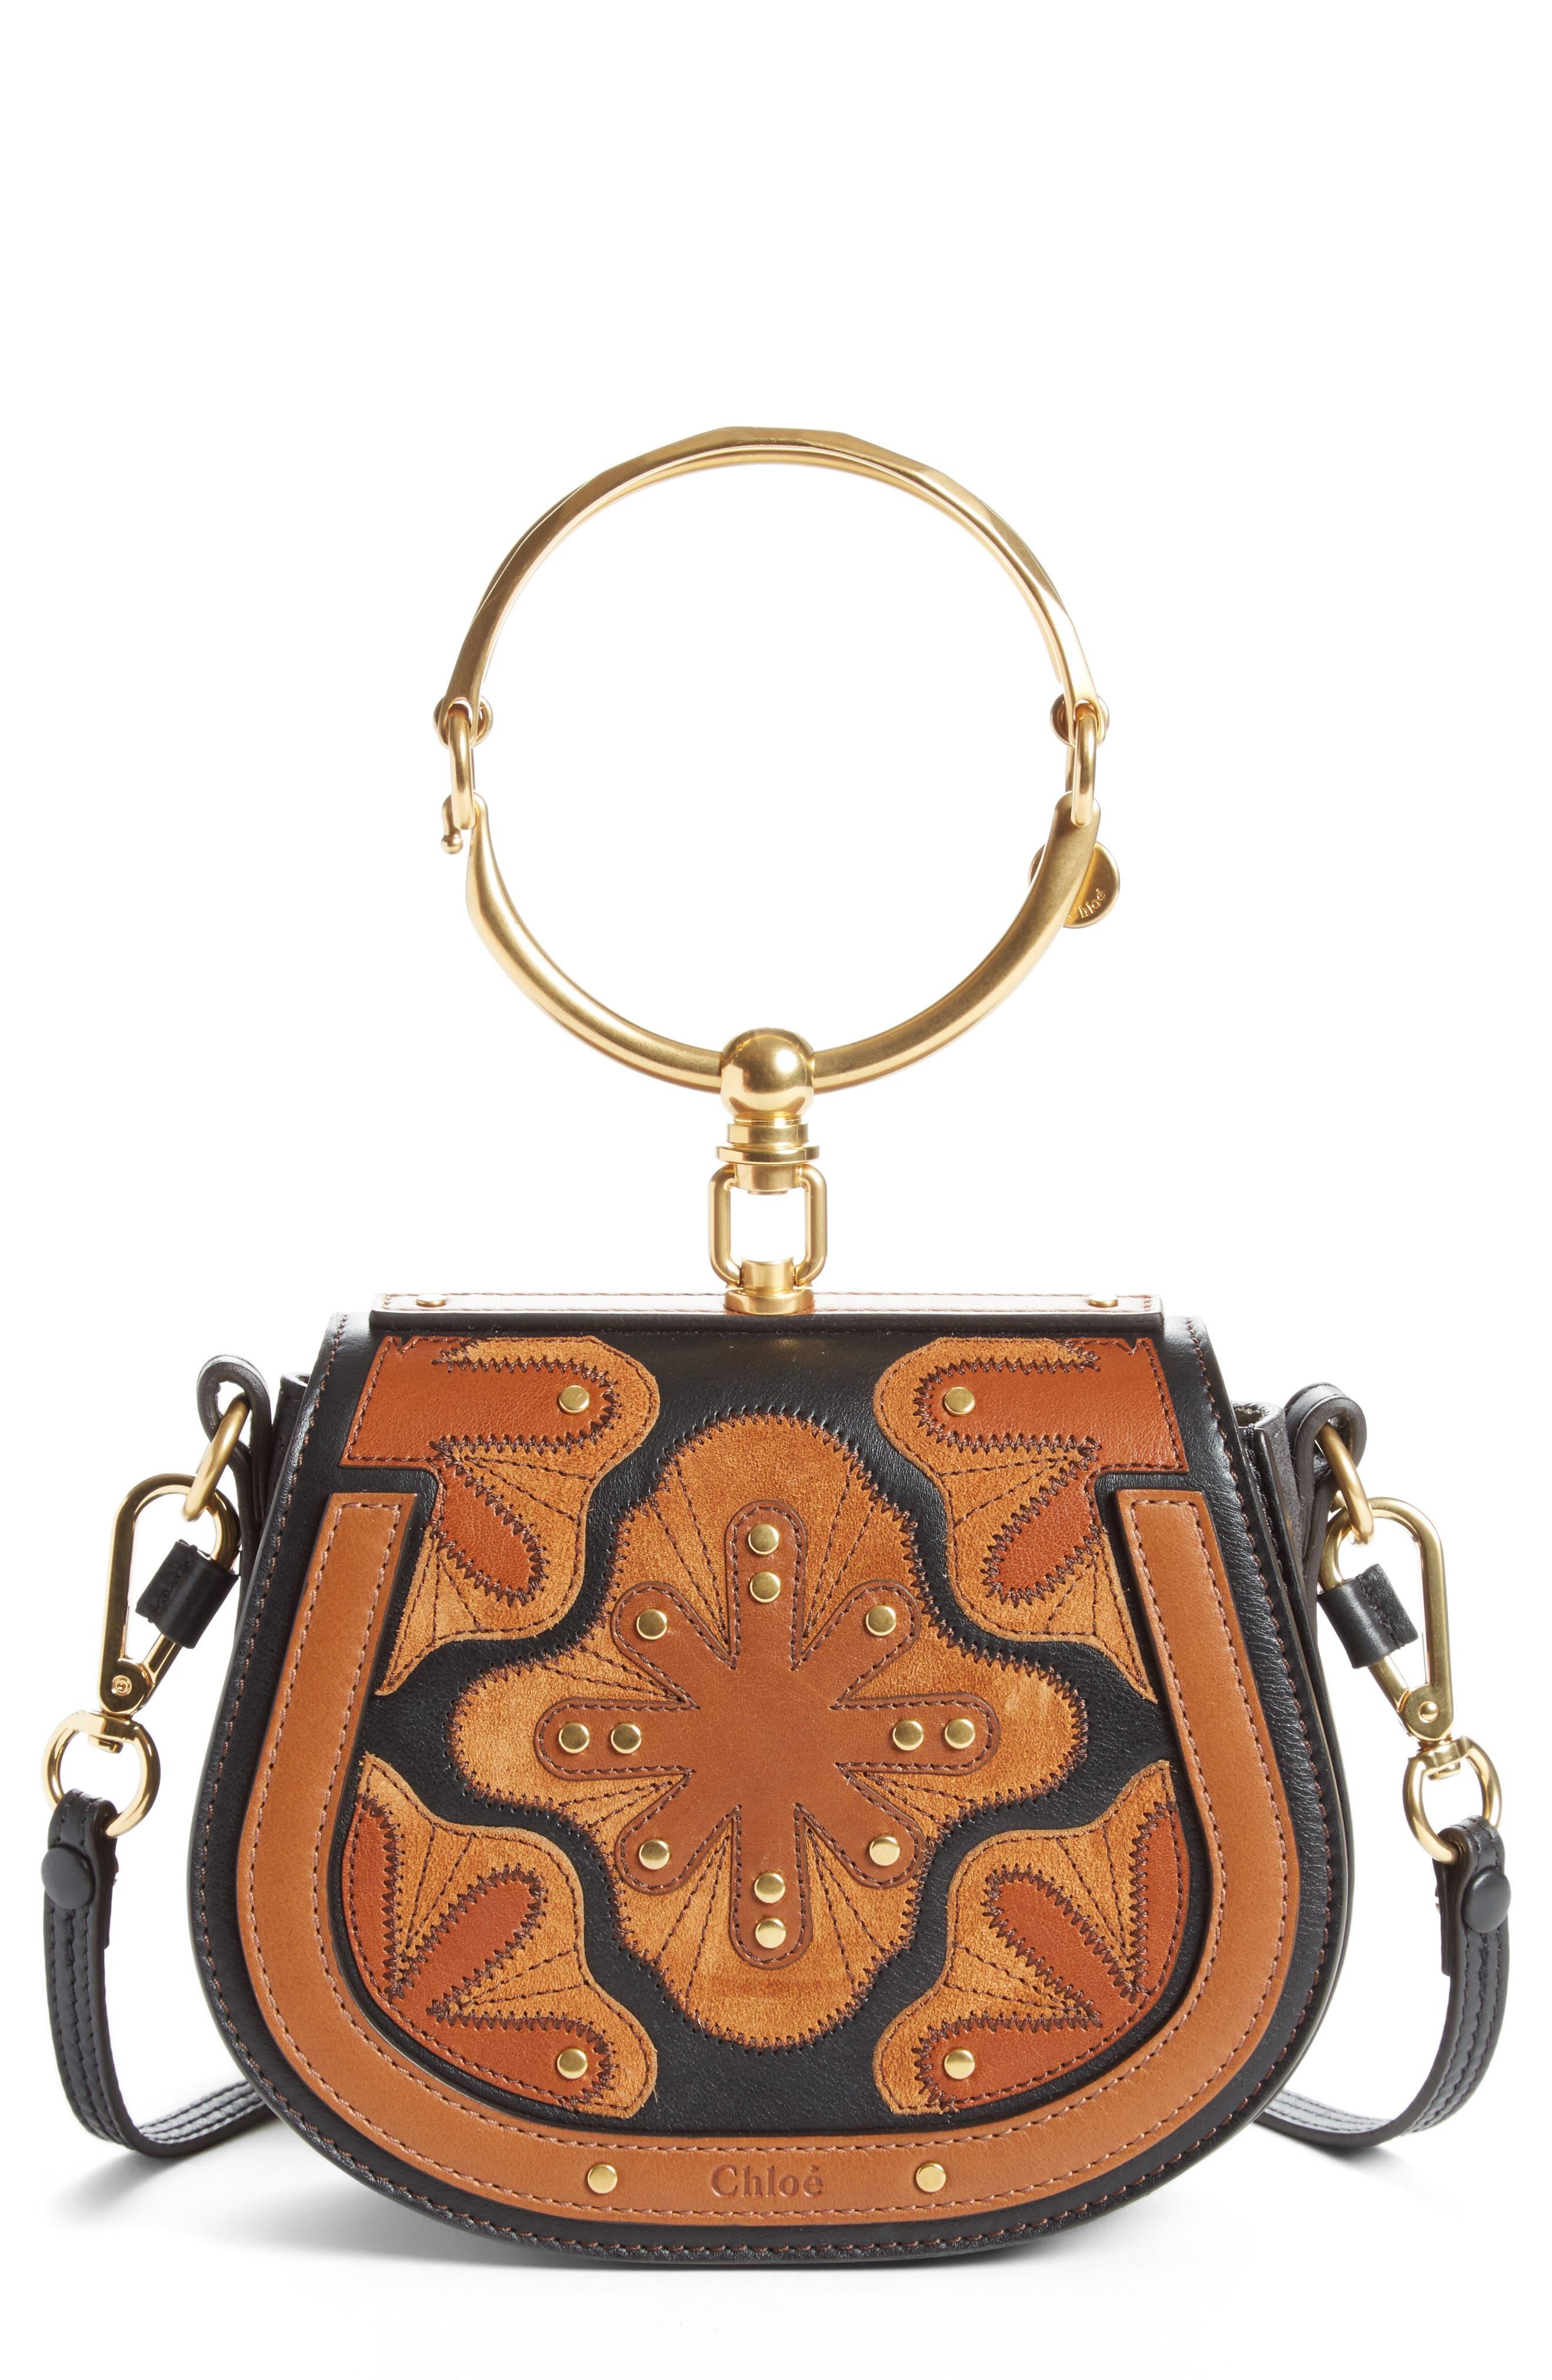 Chloé Small Nile Calfskin Leather Bracelet Bag